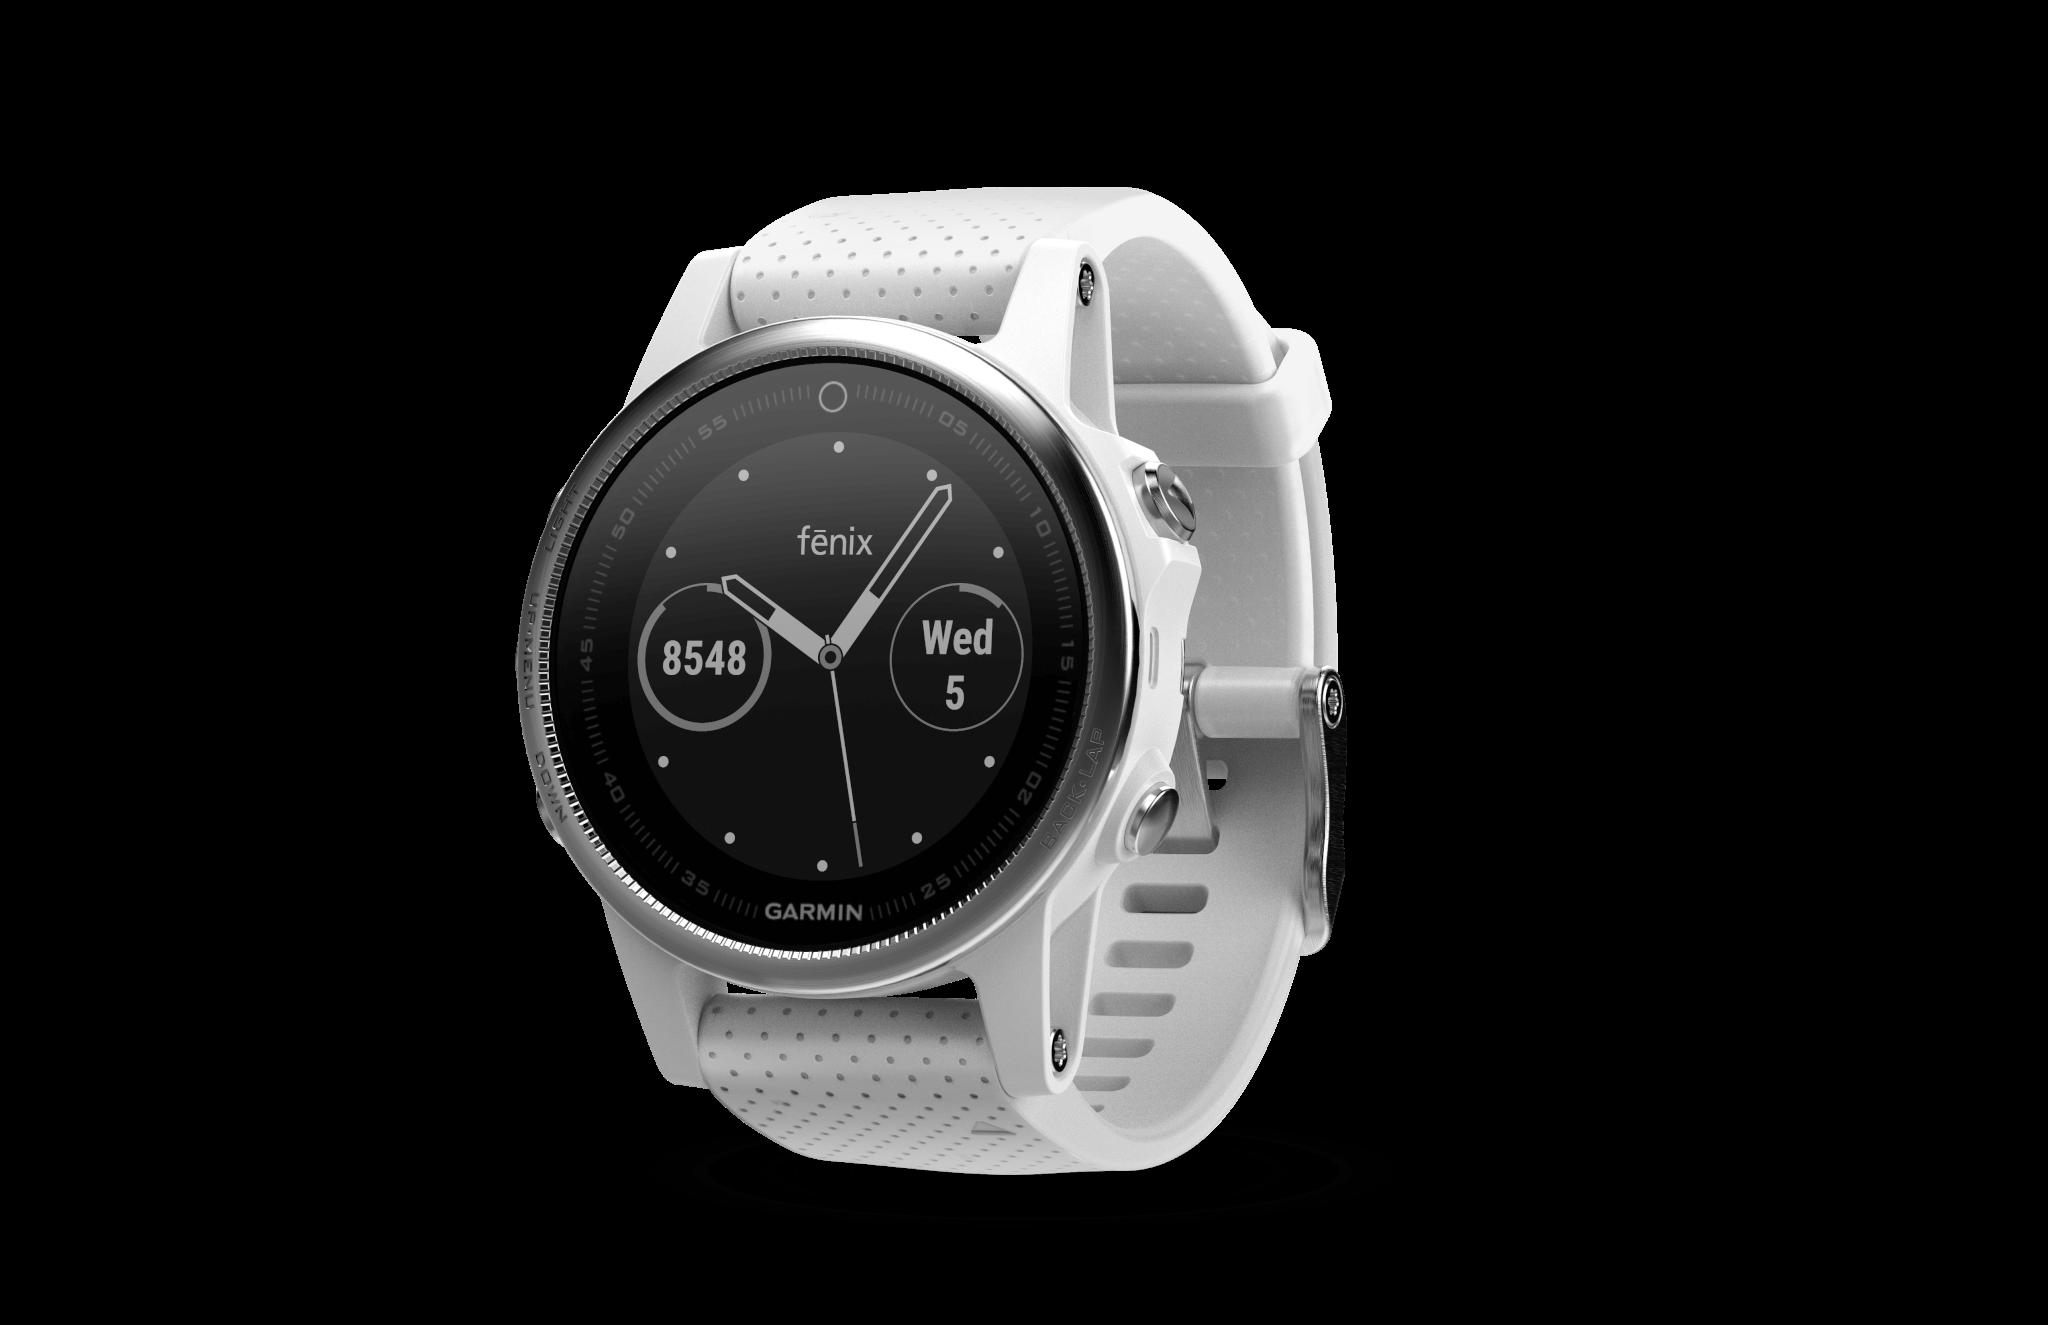 Bon plan : la montre GPS multisports Garmin Fenix 5S à 349,99 euros pour le Prime Day Amazon